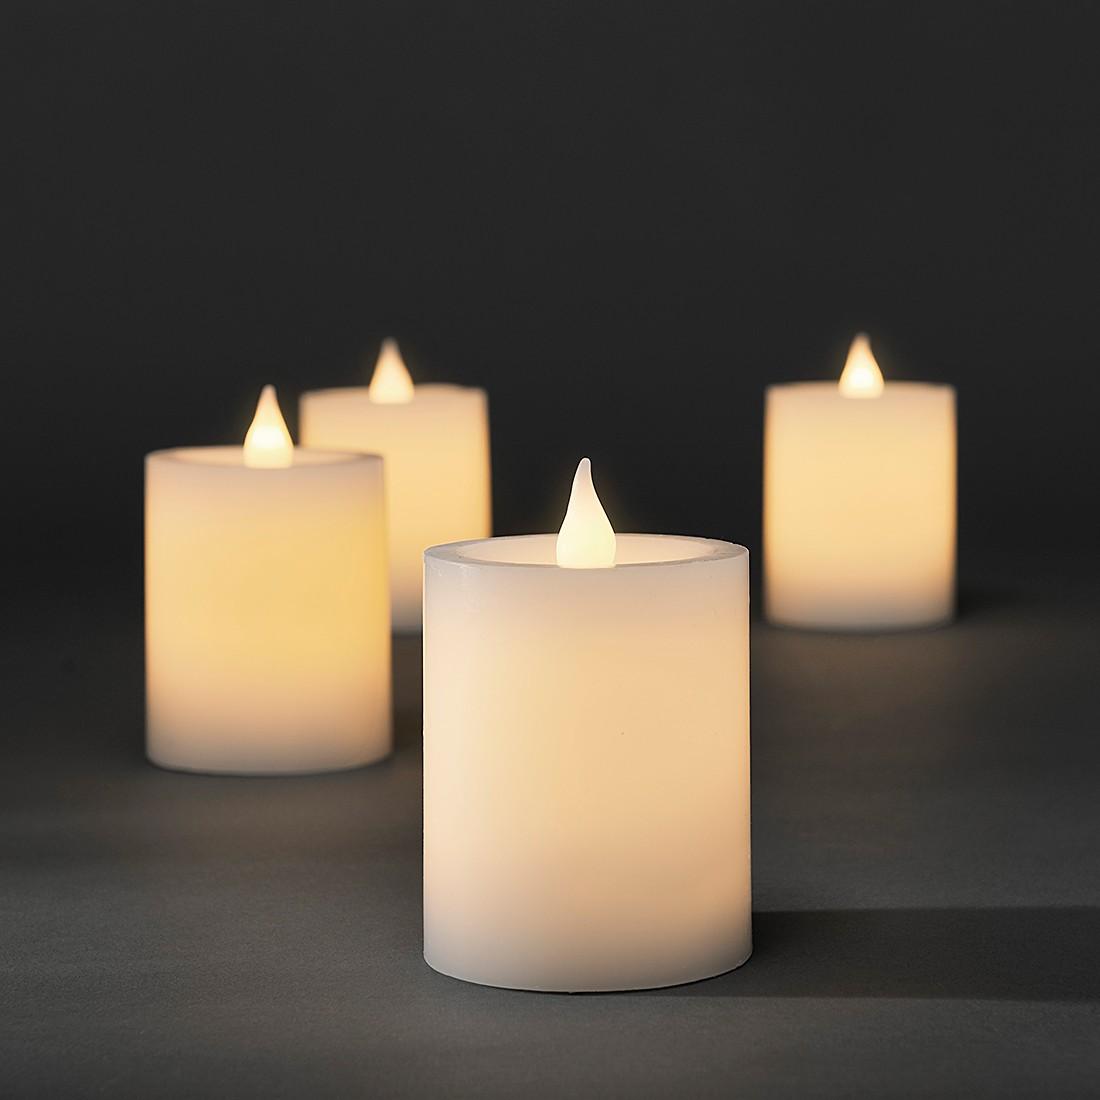 EEK A+, LED Weiße Echtwachskerzen 4er-Set – 8 Weiß flackernde Dioden – batteriebetrieben, Konstsmide günstig bestellen